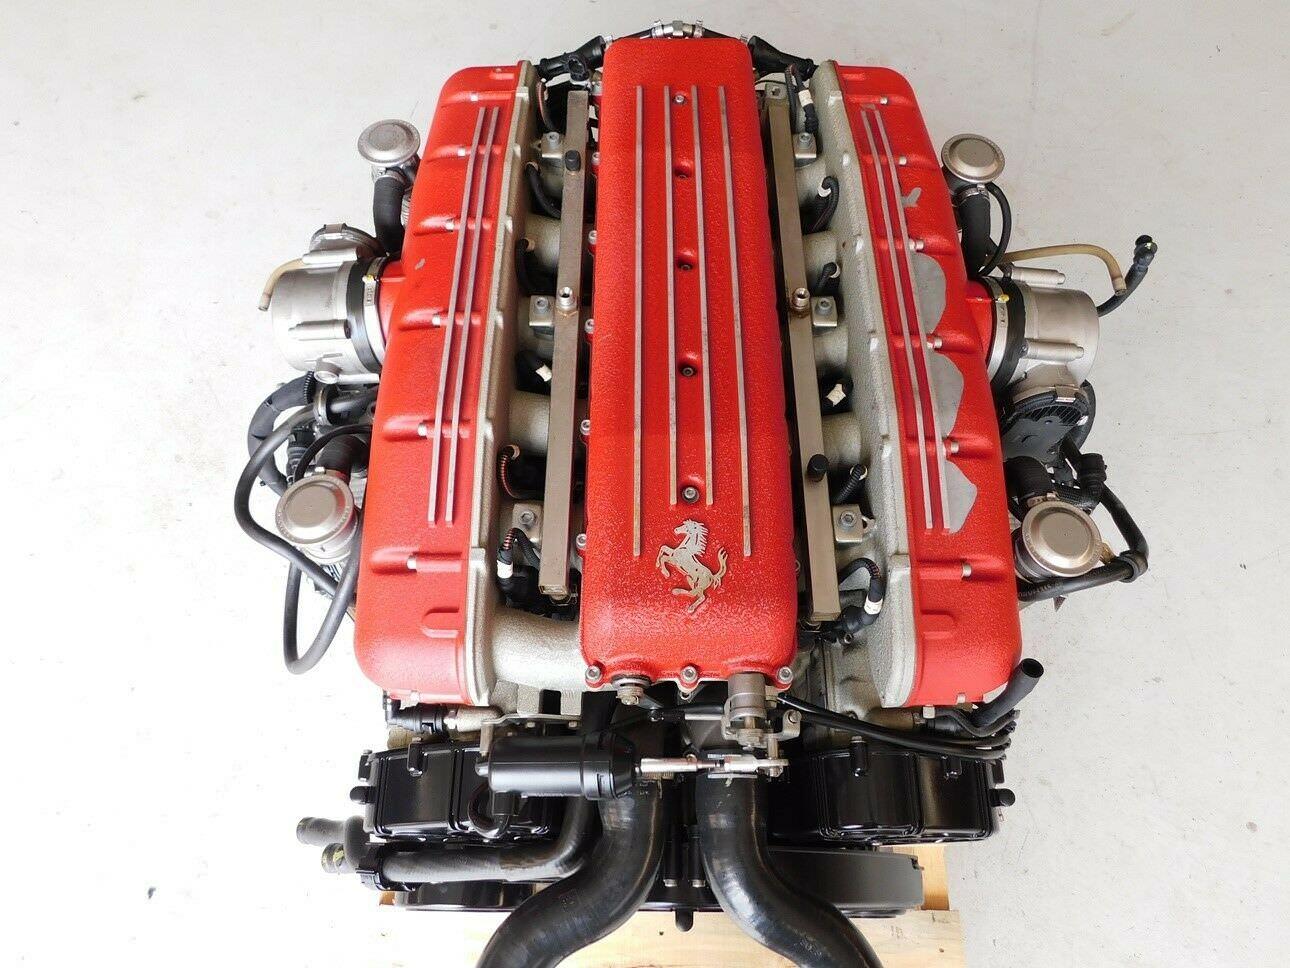 Ferrari 612 Scaglietti V12 Engine